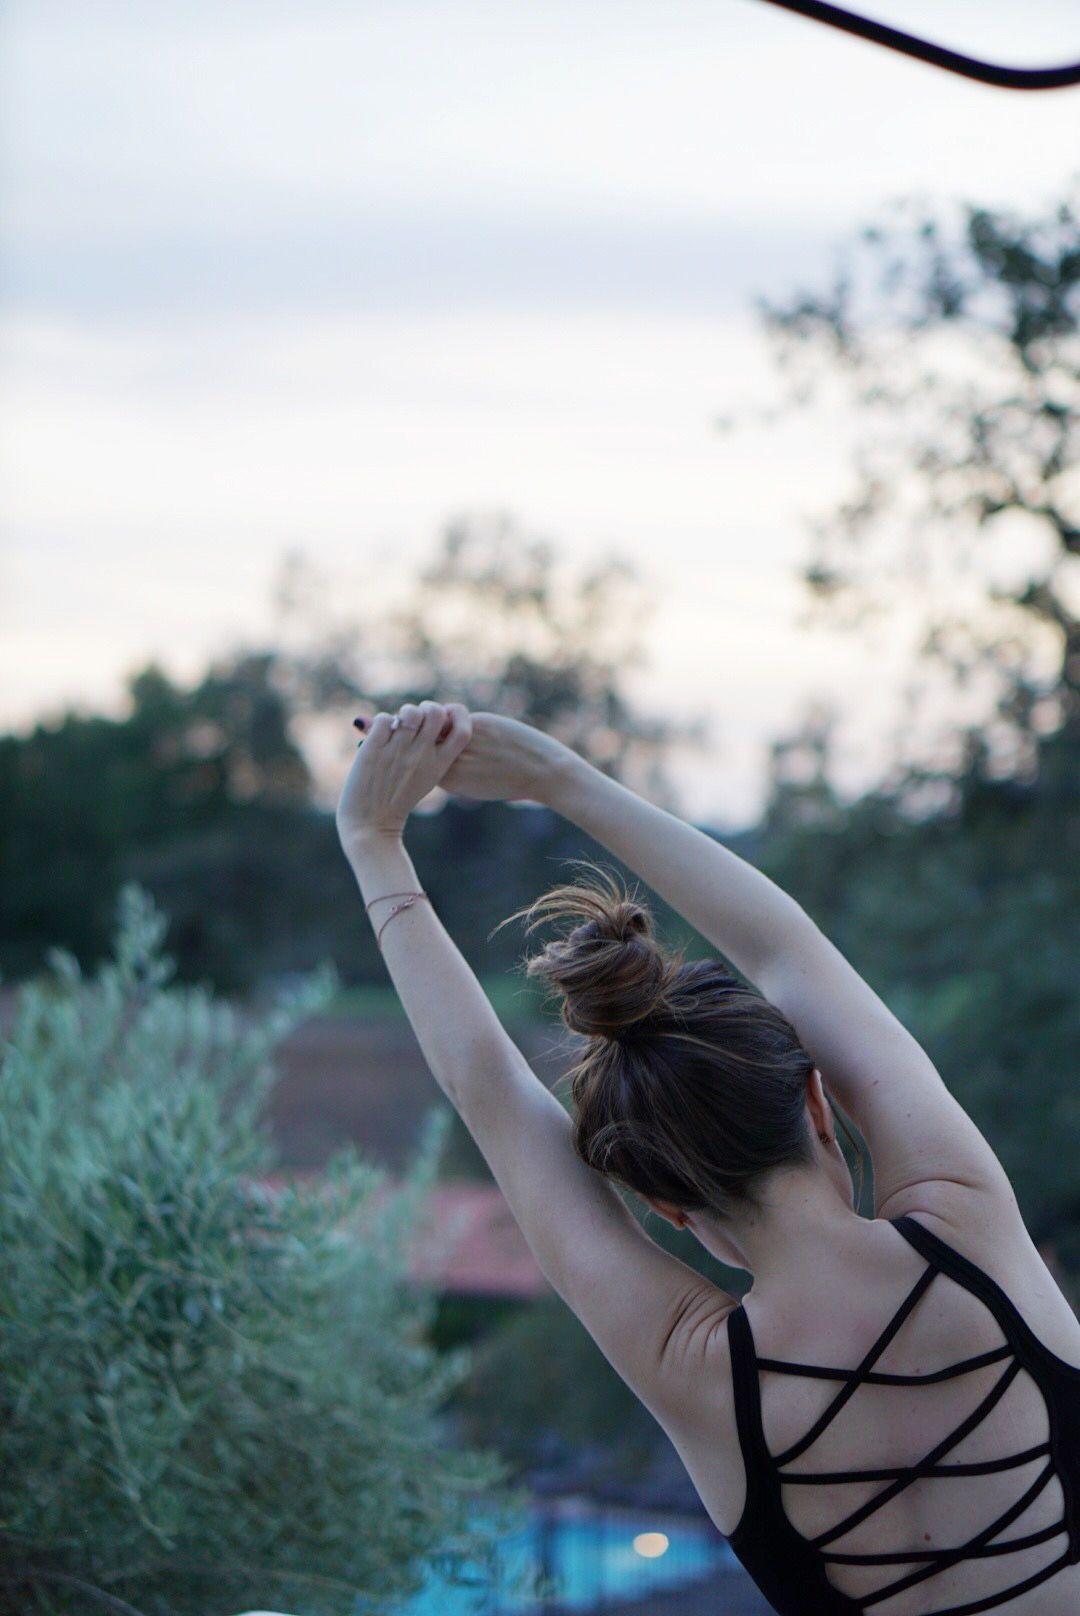 141 Wellness Tips